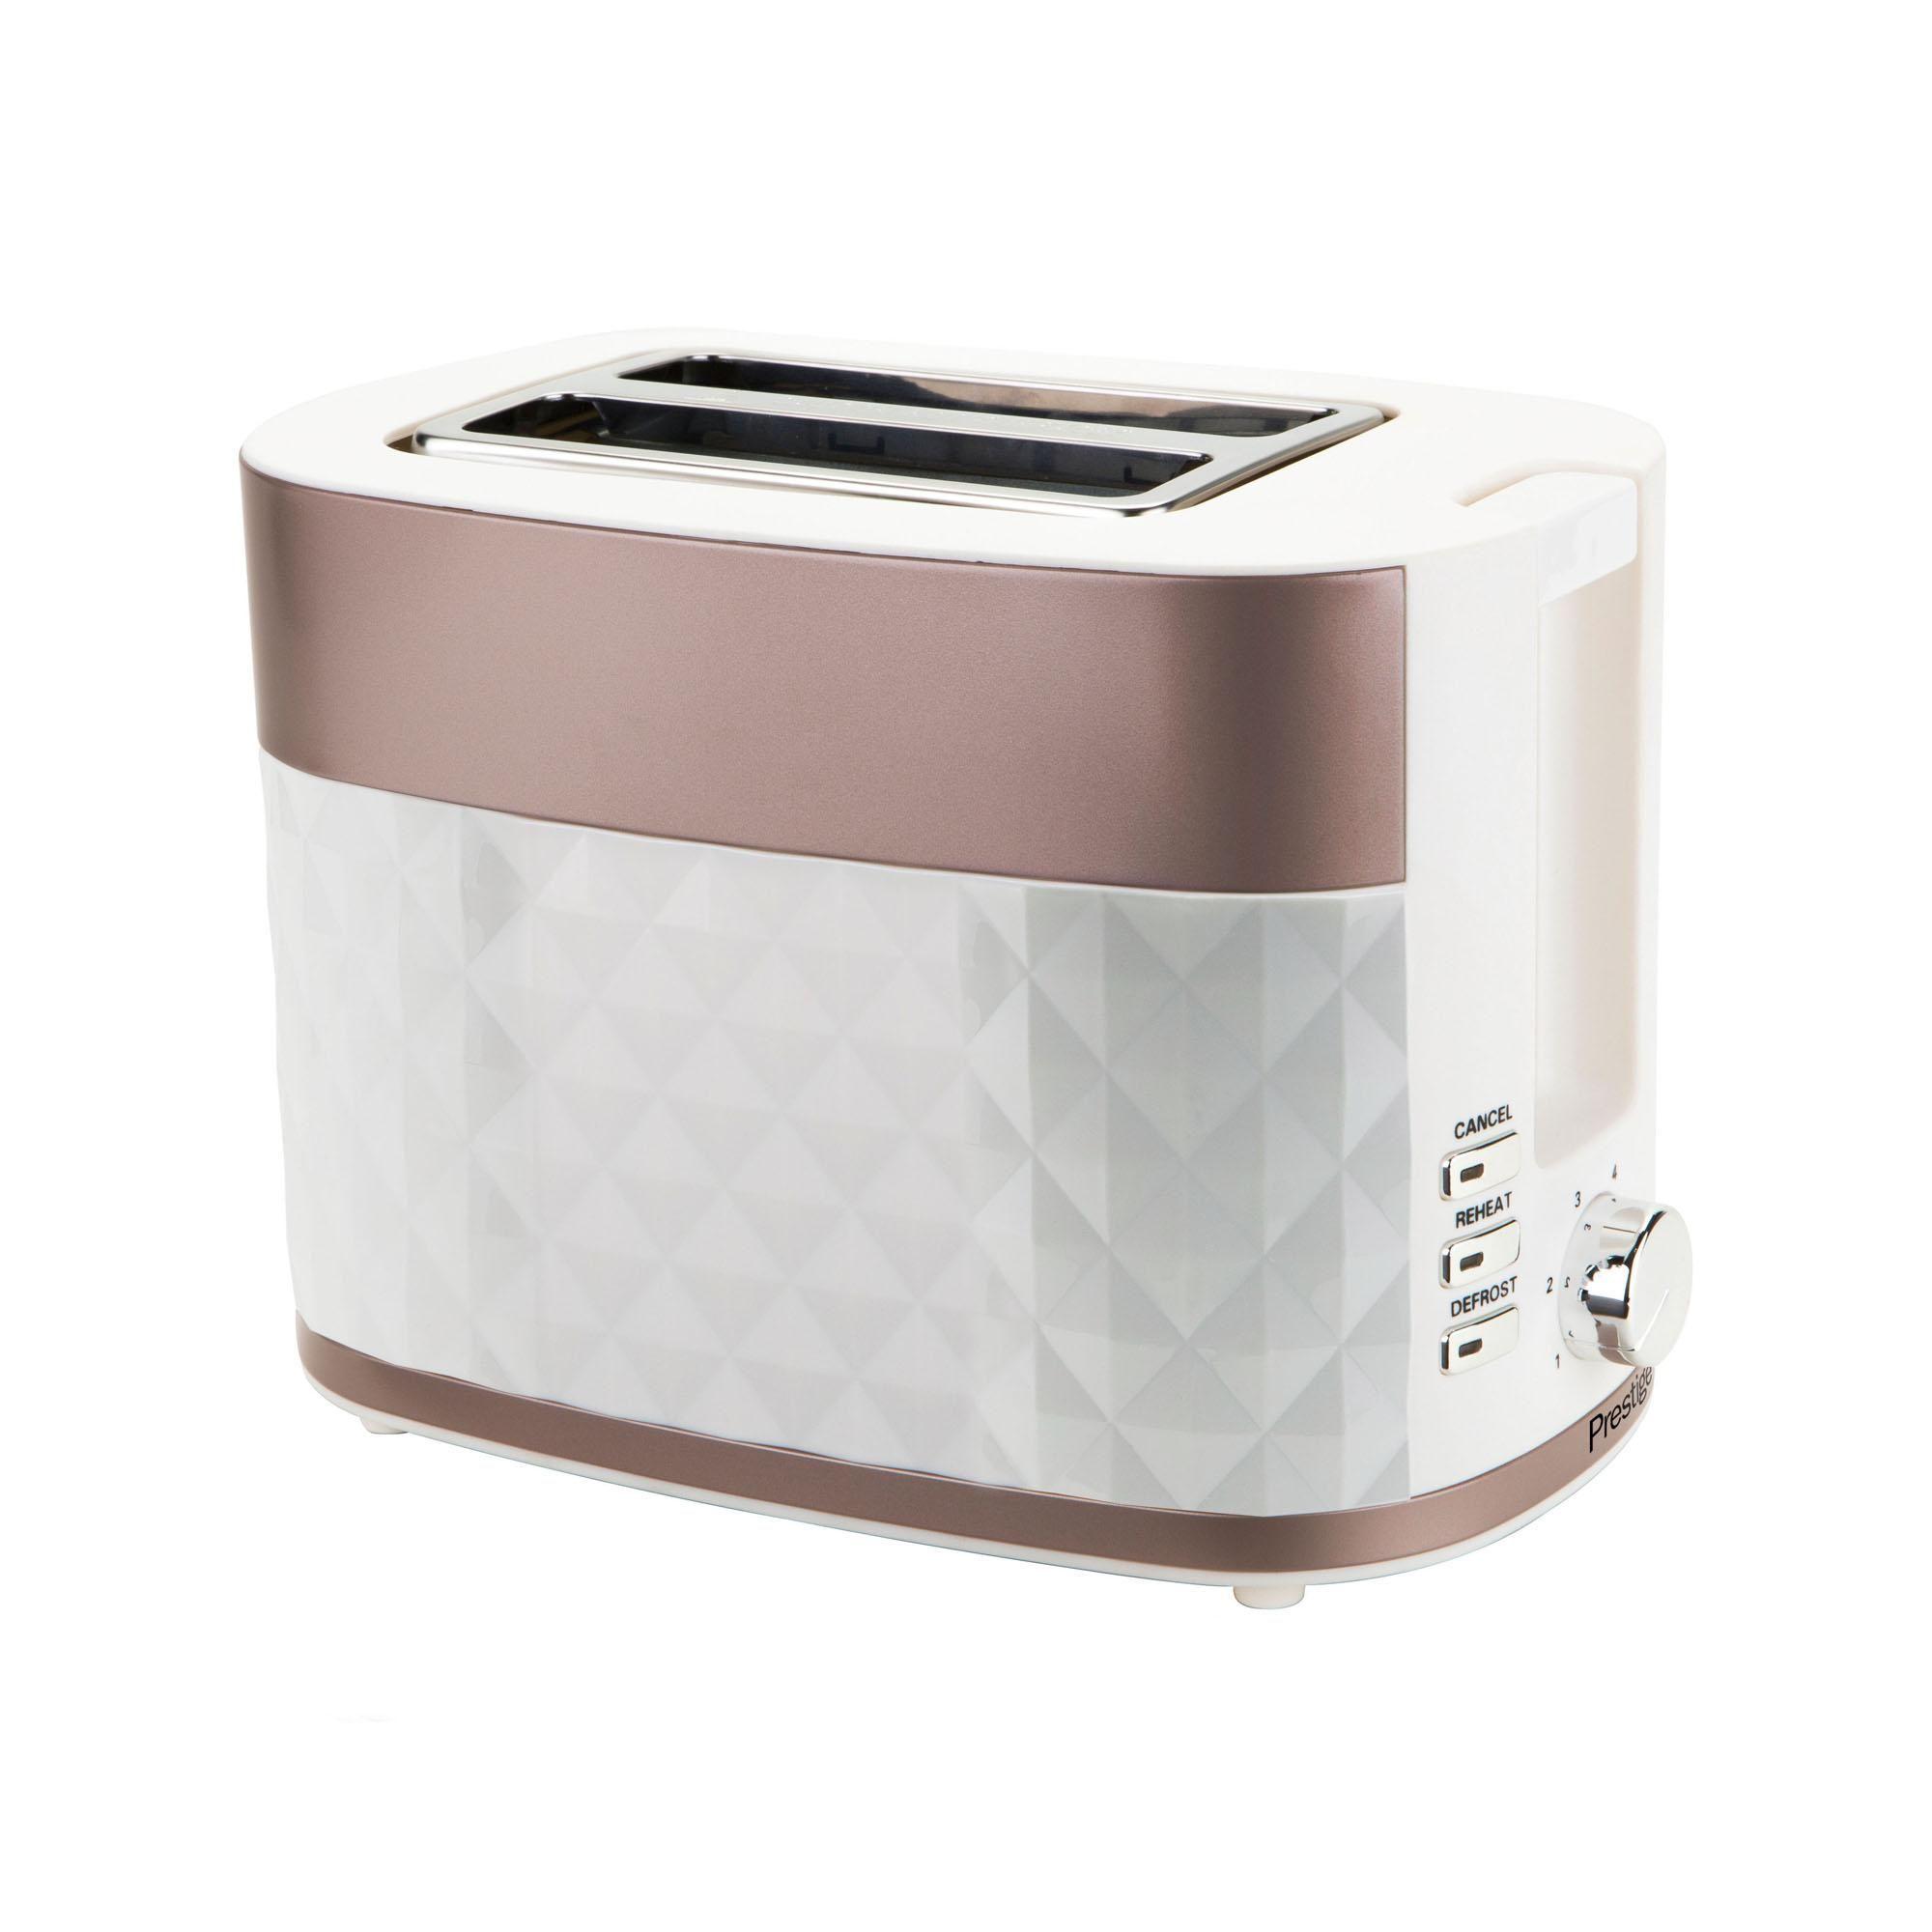 2 Slice Toaster White & Gold